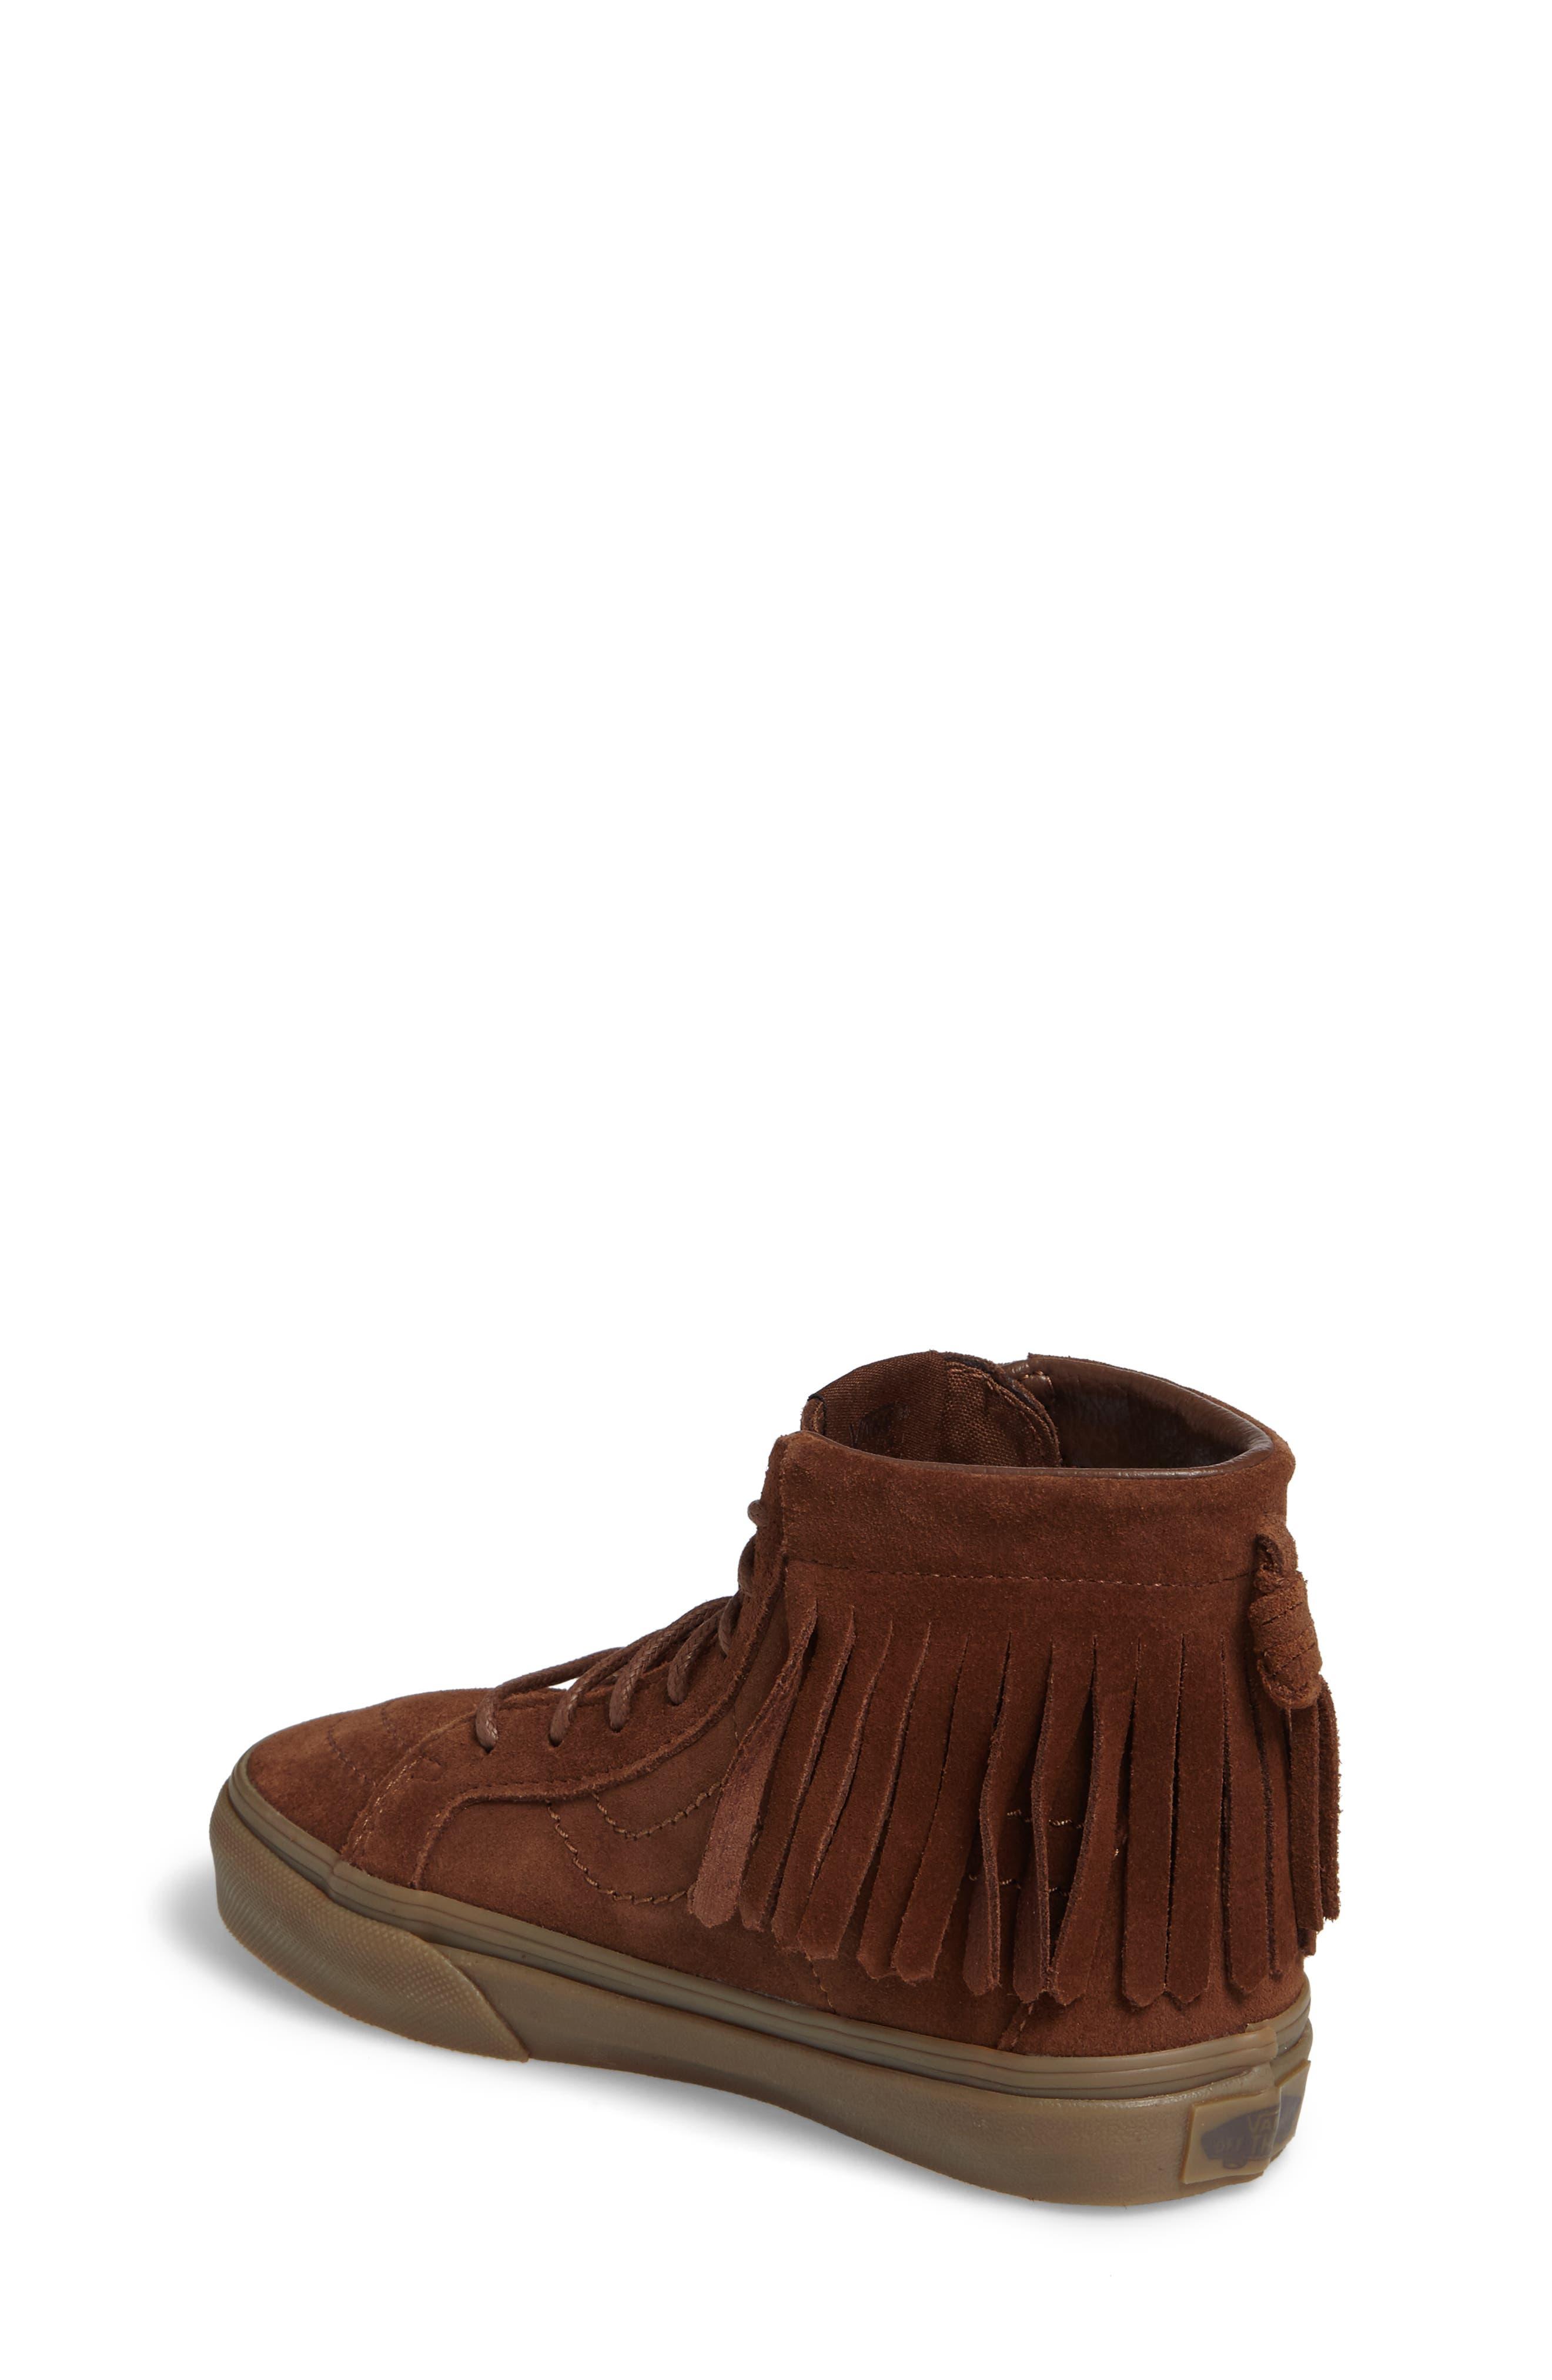 SK8-Hi Moc Sneaker,                             Alternate thumbnail 2, color,                             200